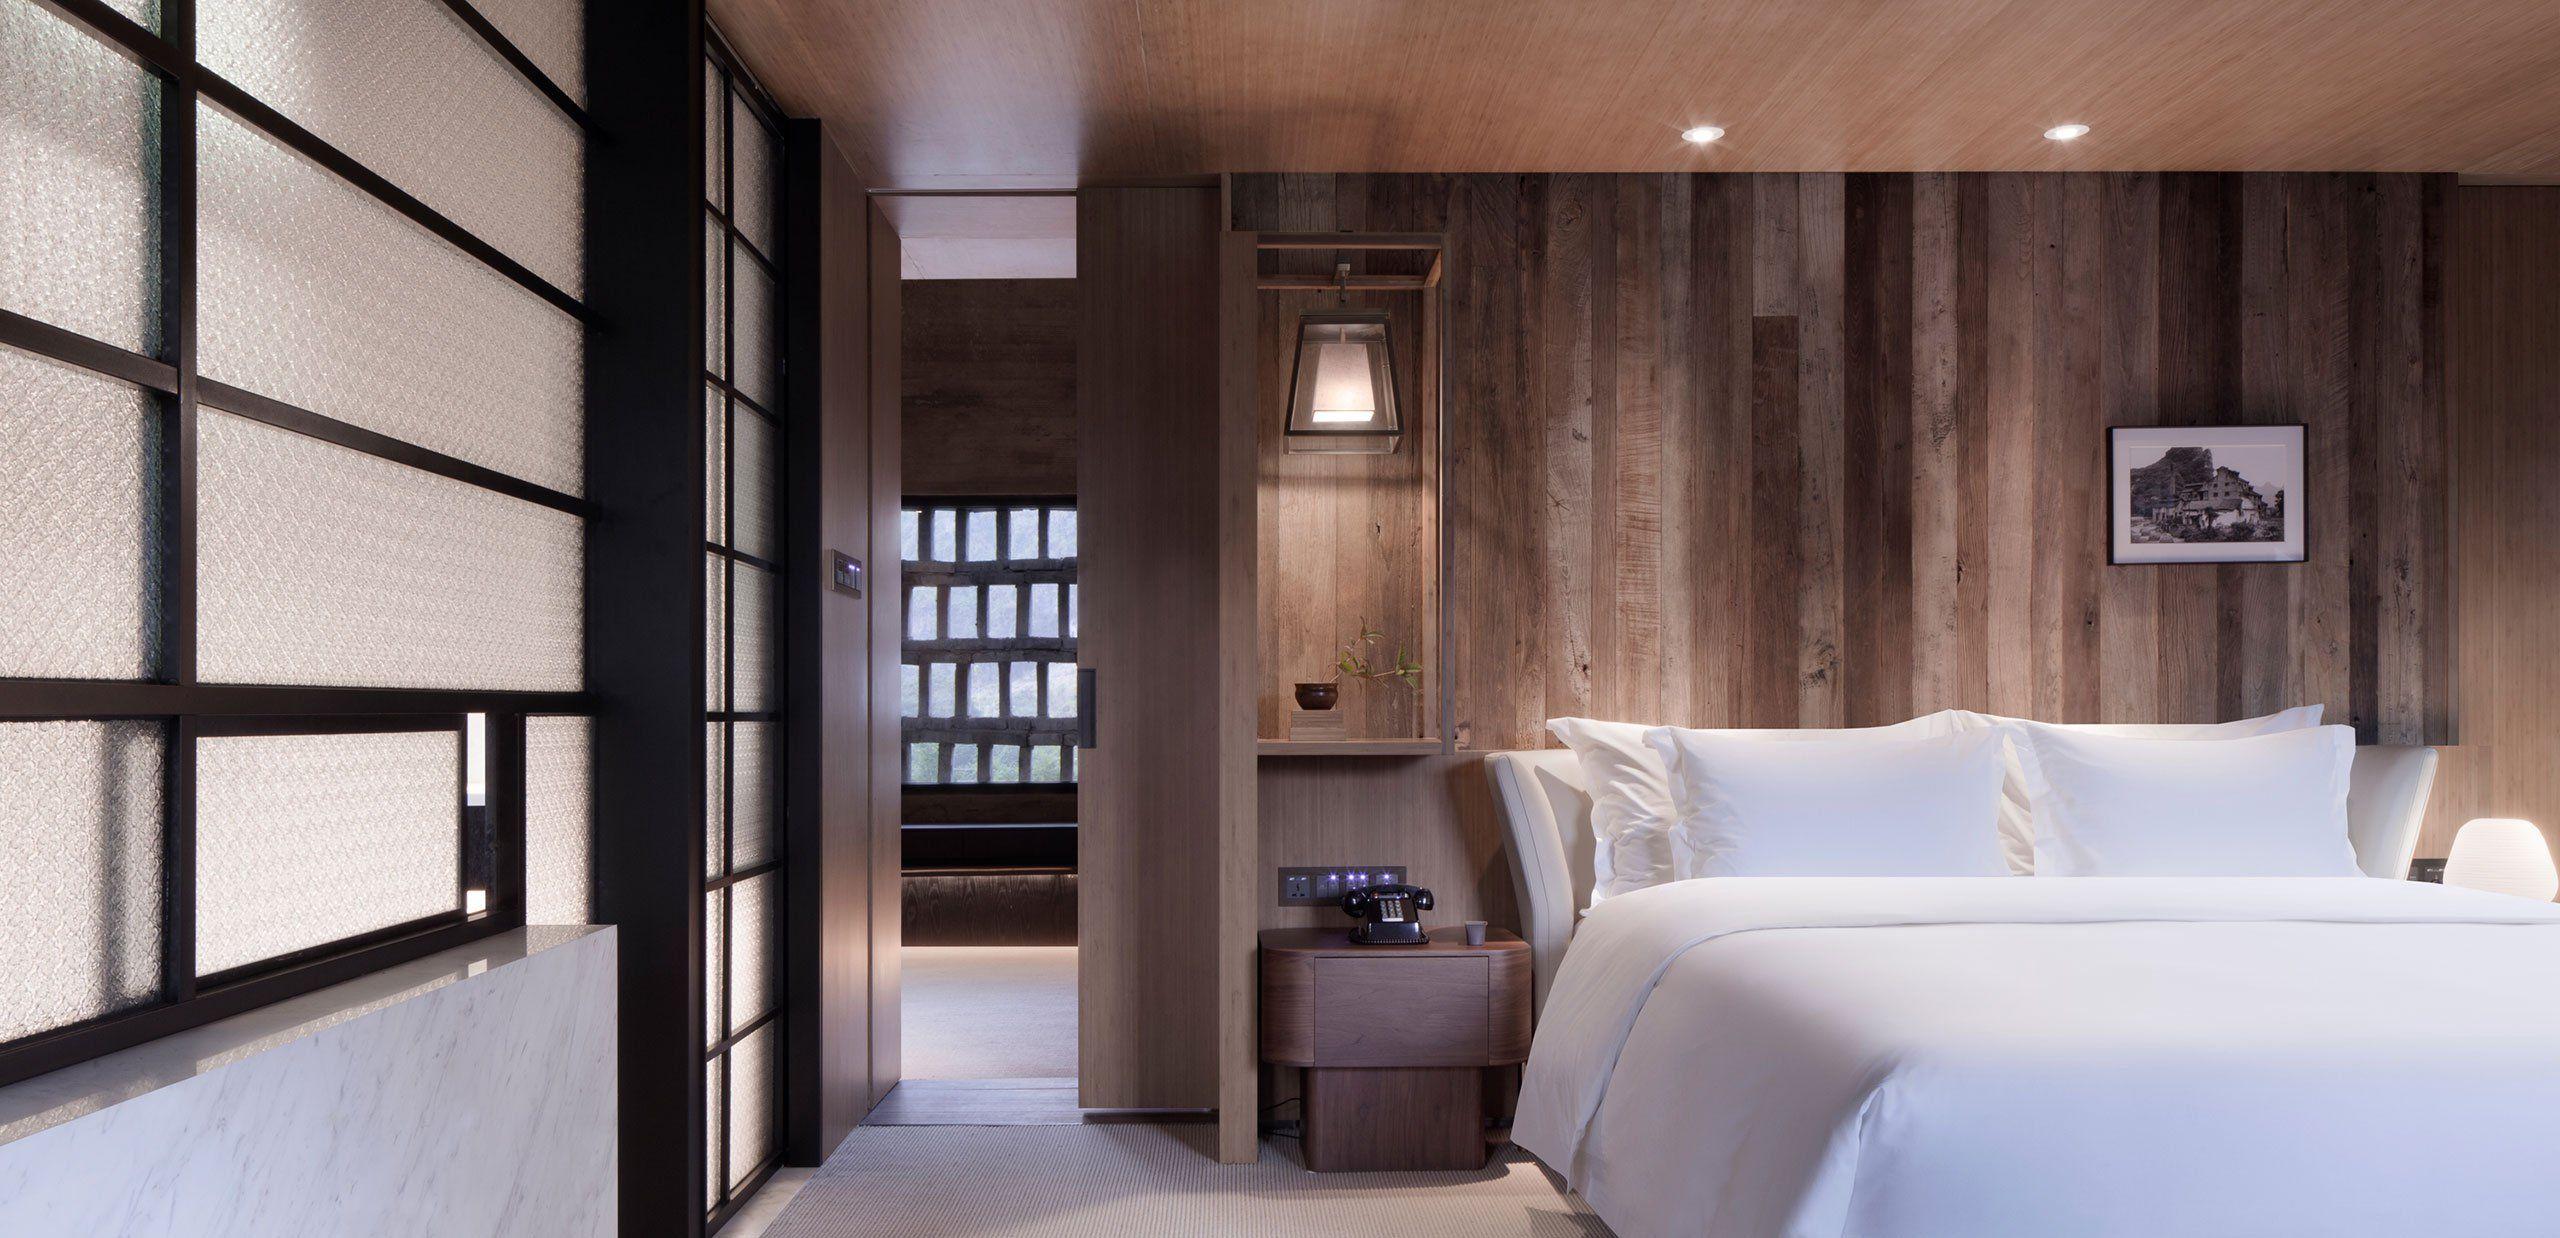 Alila Yangshuo A Retreat of Exquisite Craftsmanship Modern